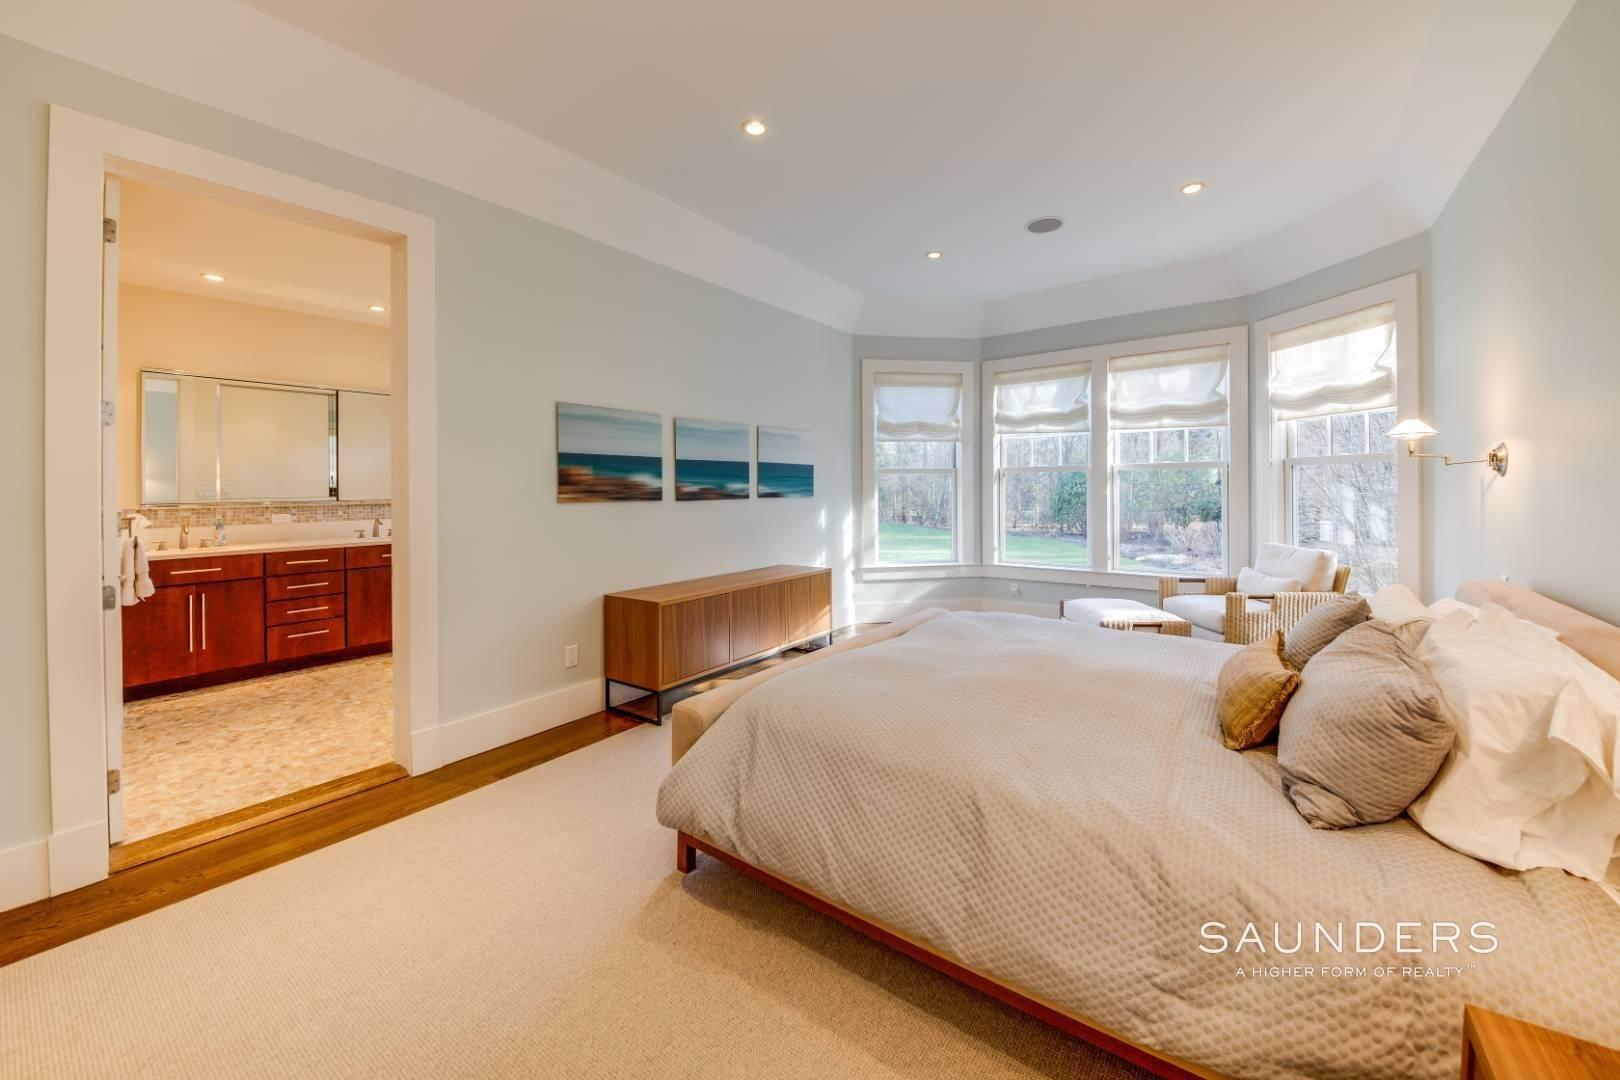 15. Single Family Homes for Sale at Wainscott South Traditional Near Beach Lane 10 Merriwood Drive, Wainscott, East Hampton Town, NY 11975